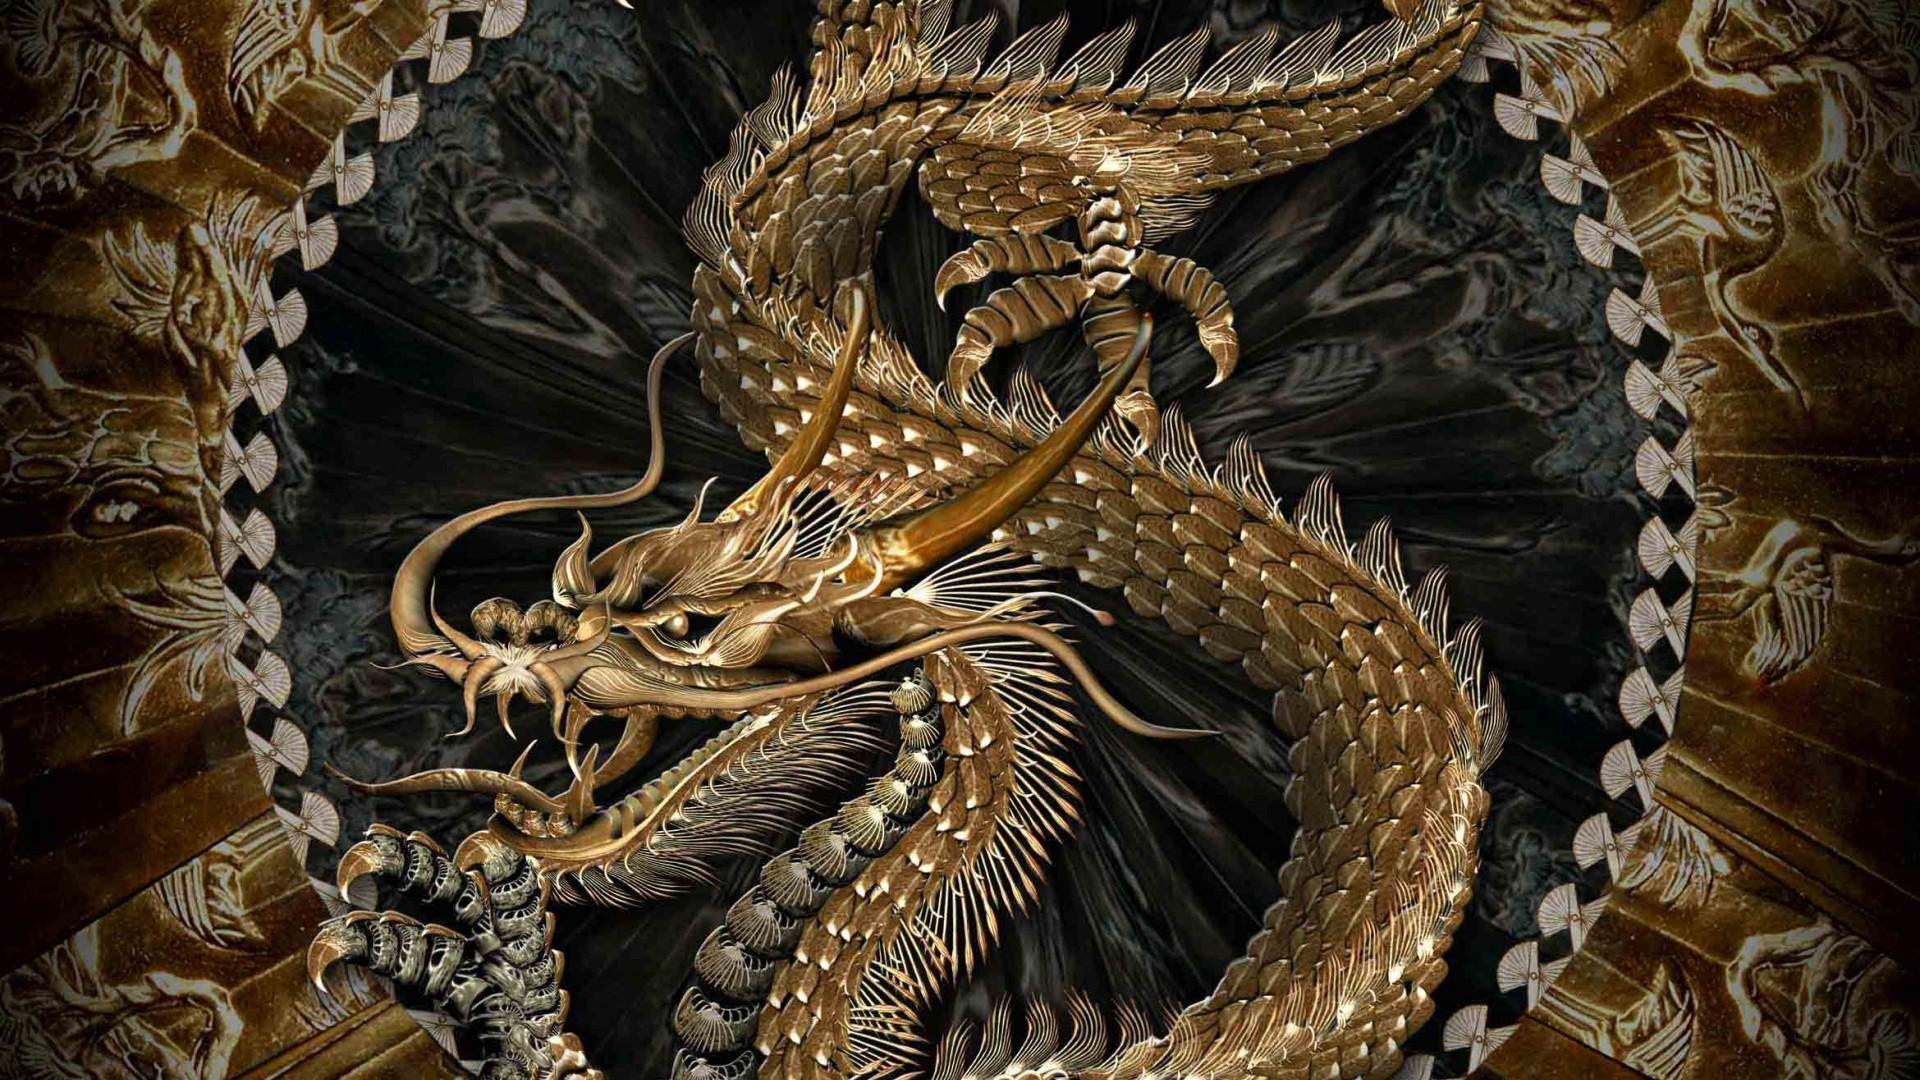 bigbackground com dragon dragon wallpaper hd 1080p html 1920x1080